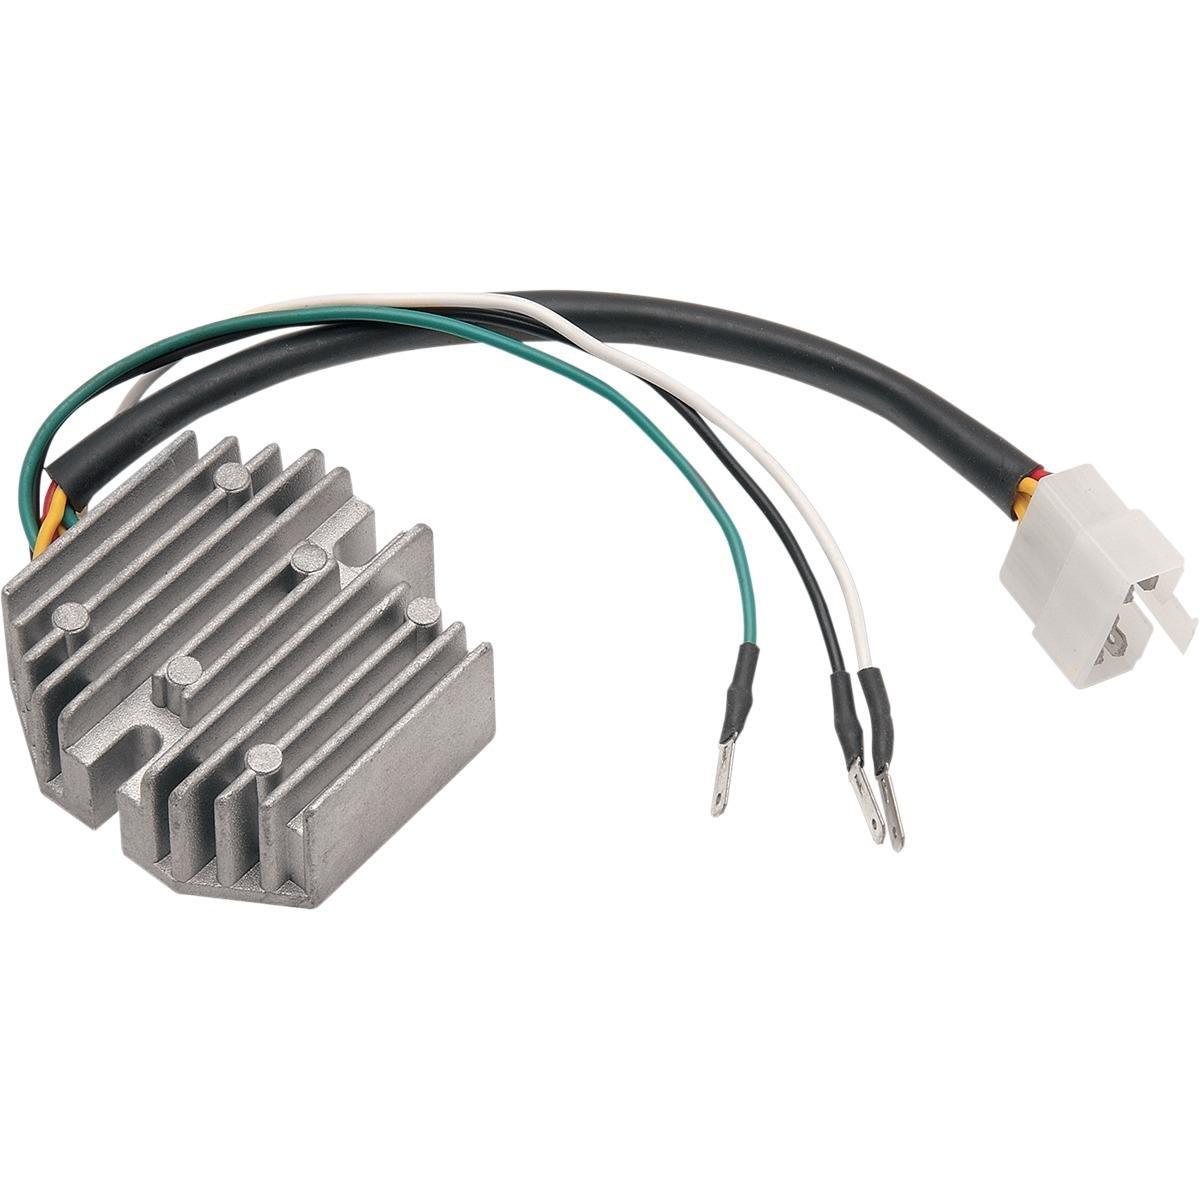 ... Honda Element ke Light Bulb on honda element knock sensor, honda element  tail light bulb Tips: Trailer Wiring Harness ...